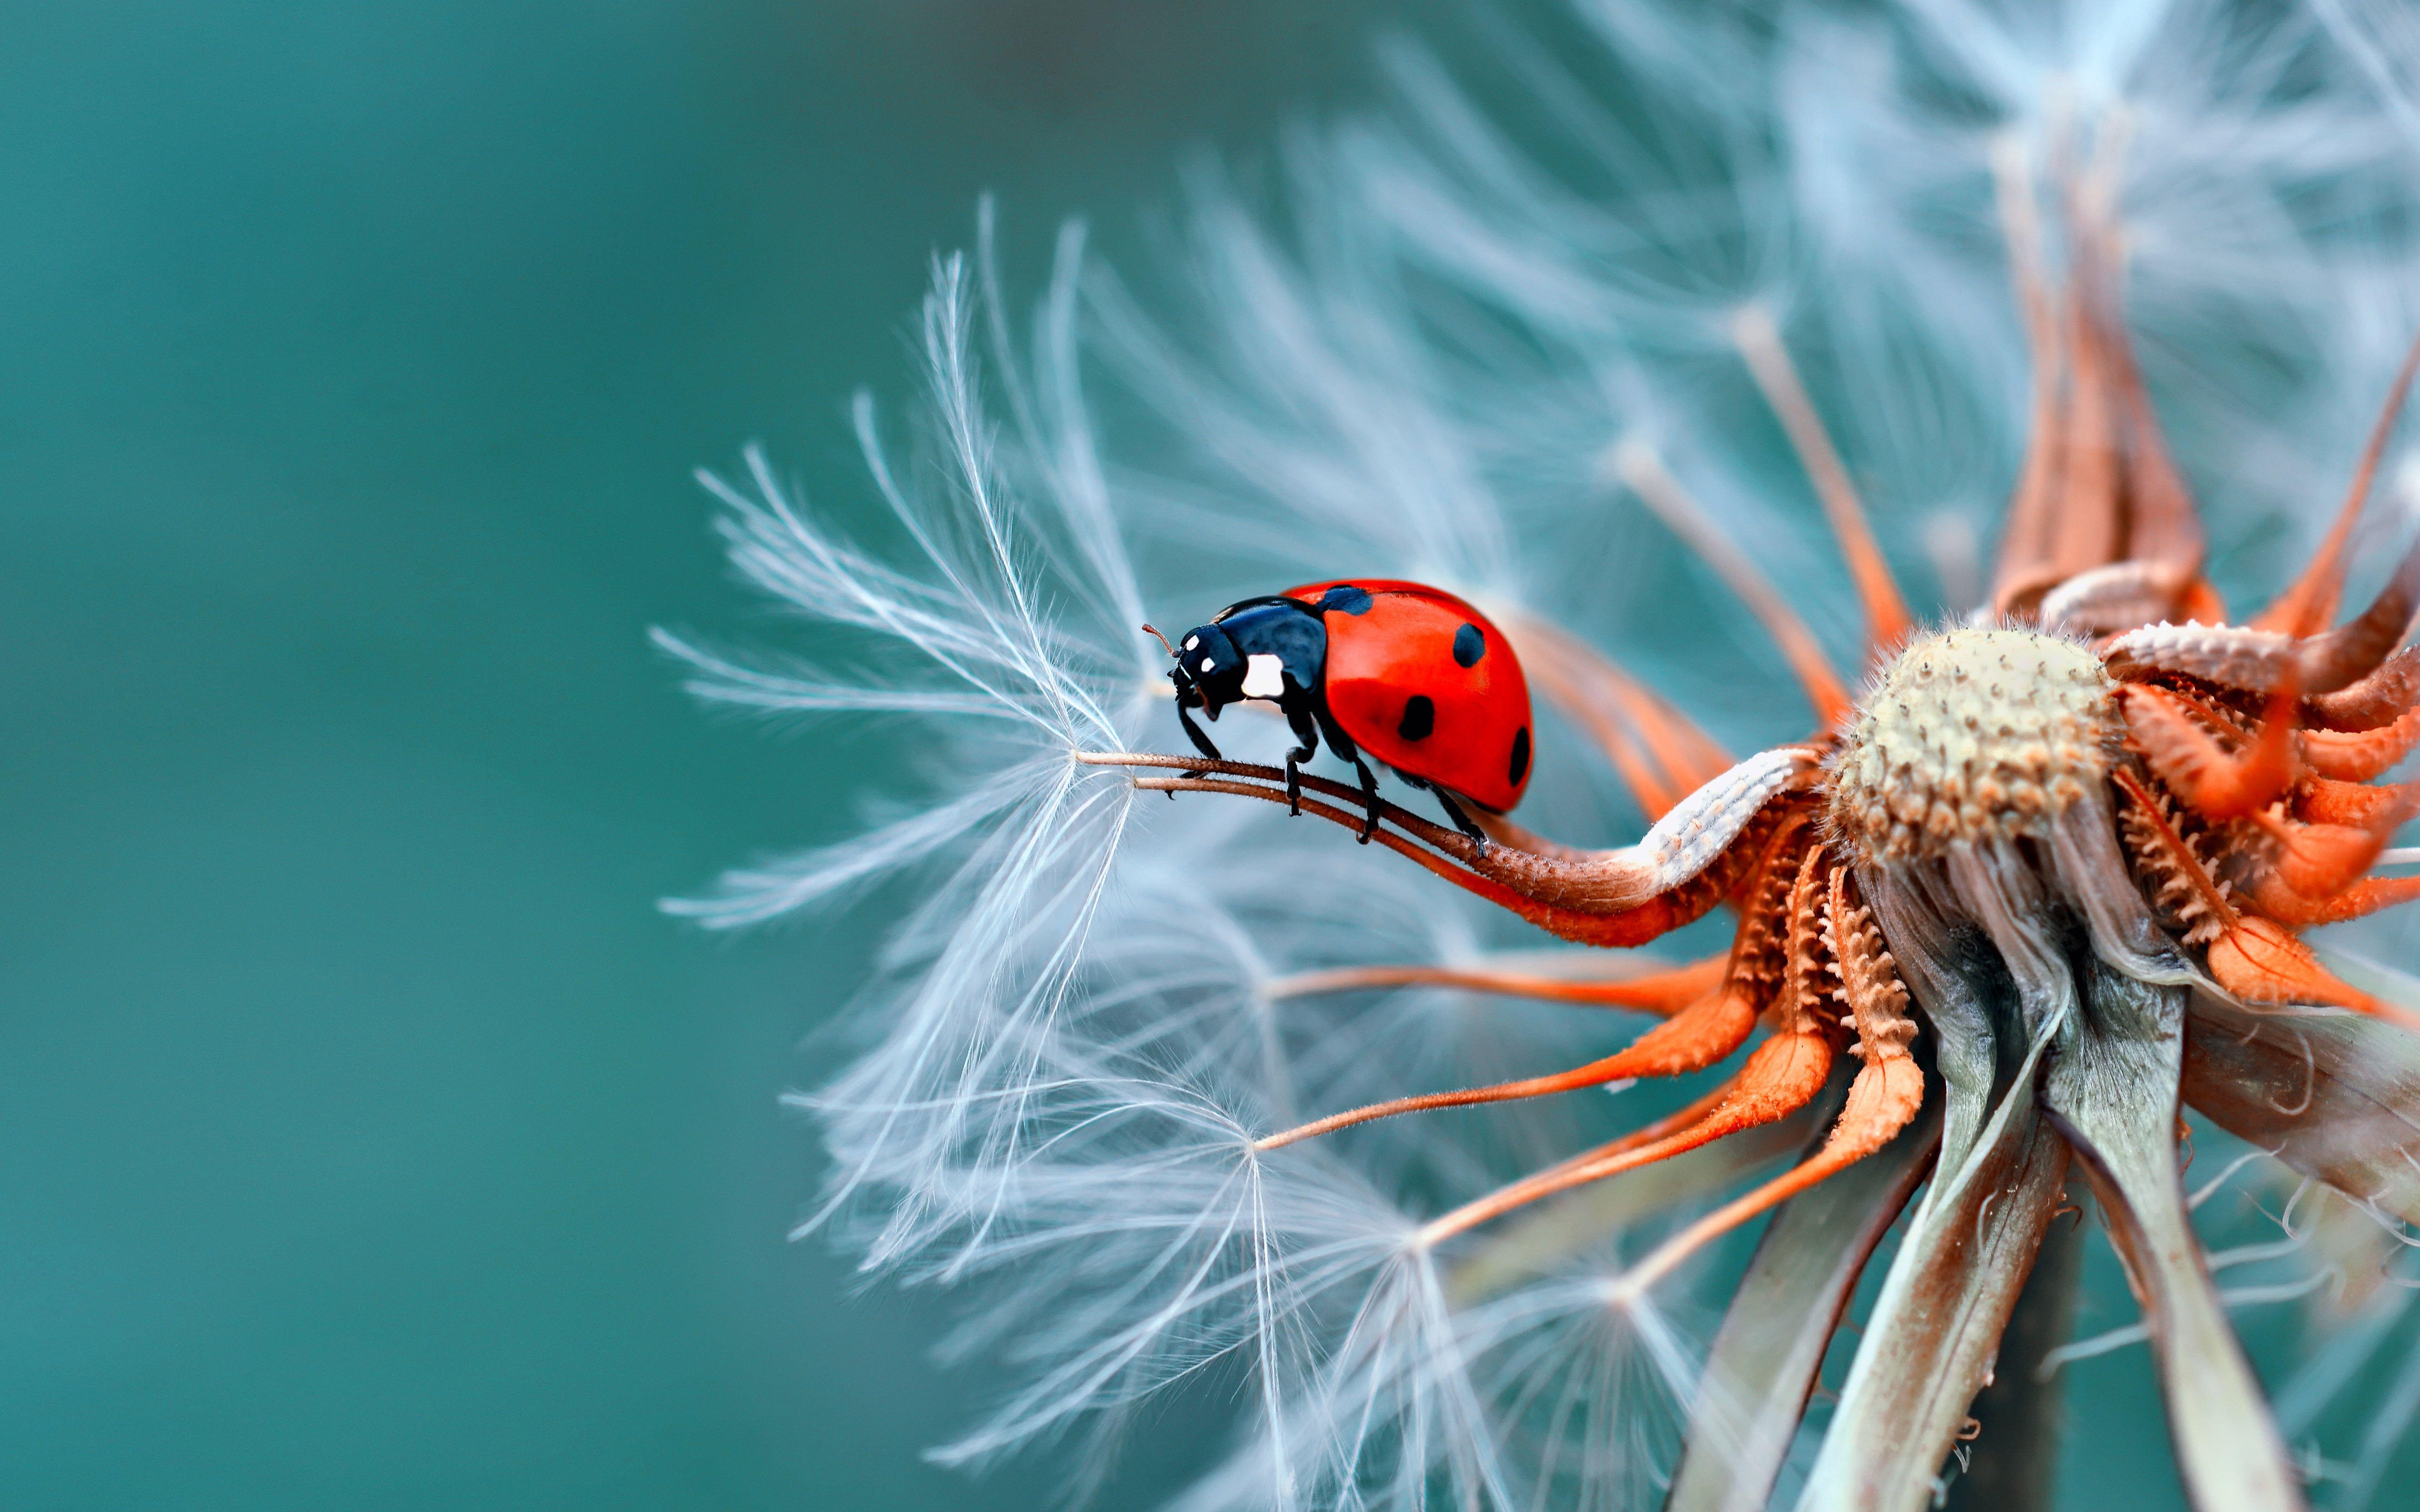 Insect Bubamara On Dandelion Macro Photography Ultra Hd Wallpapers